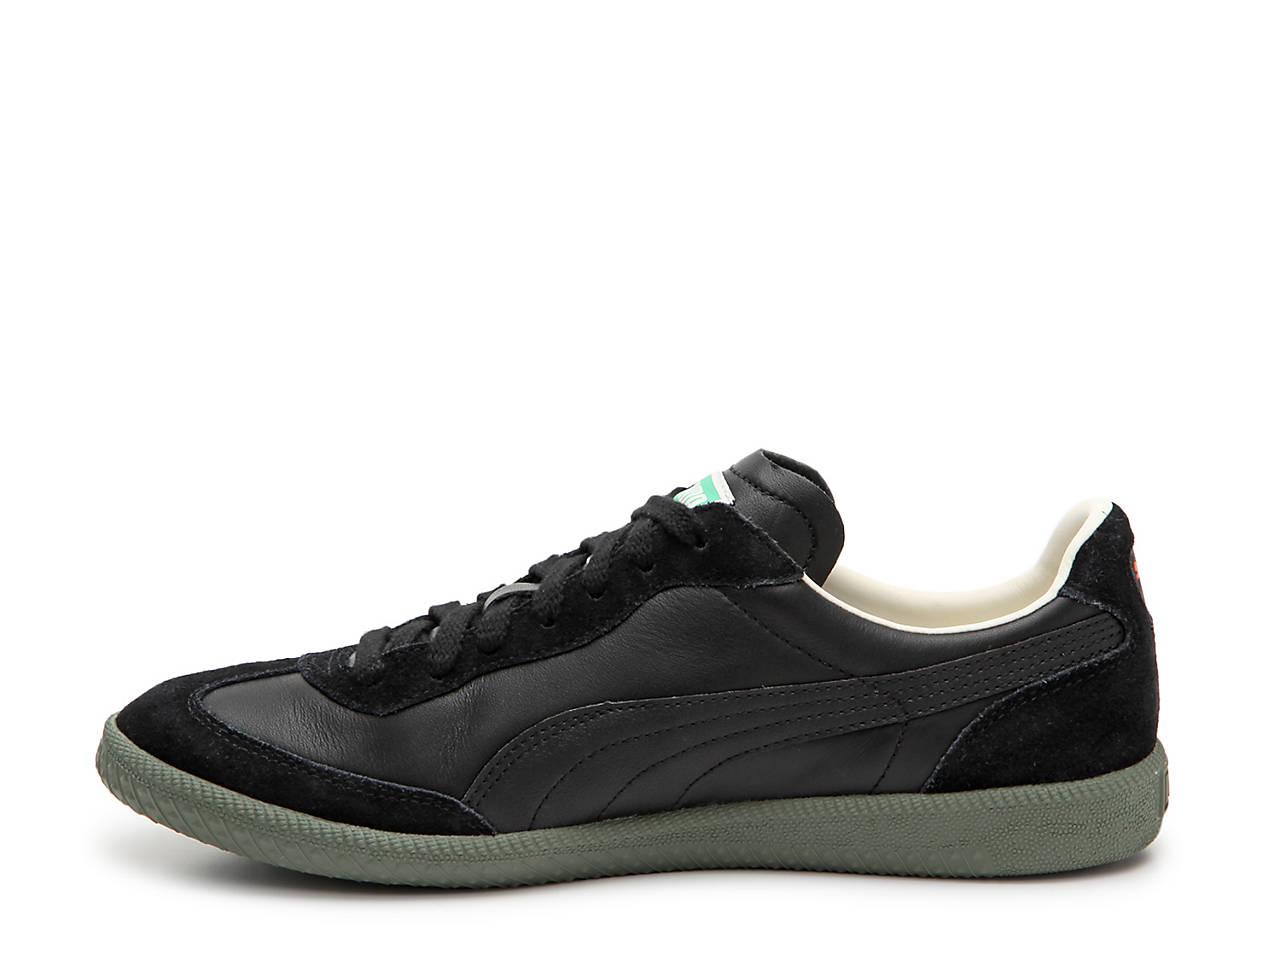 4726002eb4f Puma Super Liga OG Retro Sneaker - Men s Men s Shoes